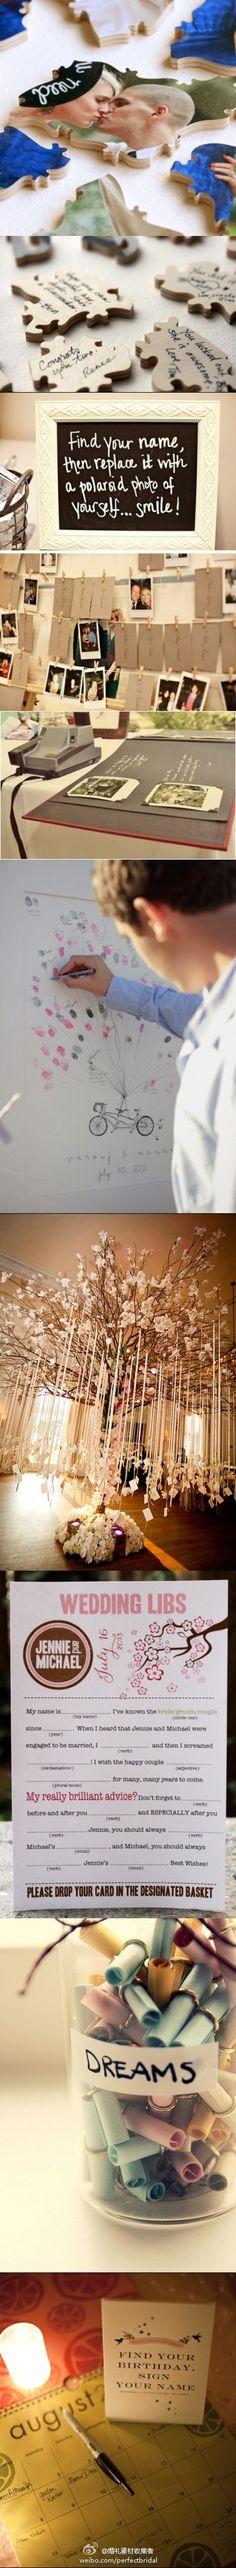 wedding sign-in ideas. pretty clever stuff. Really like the calendar idea